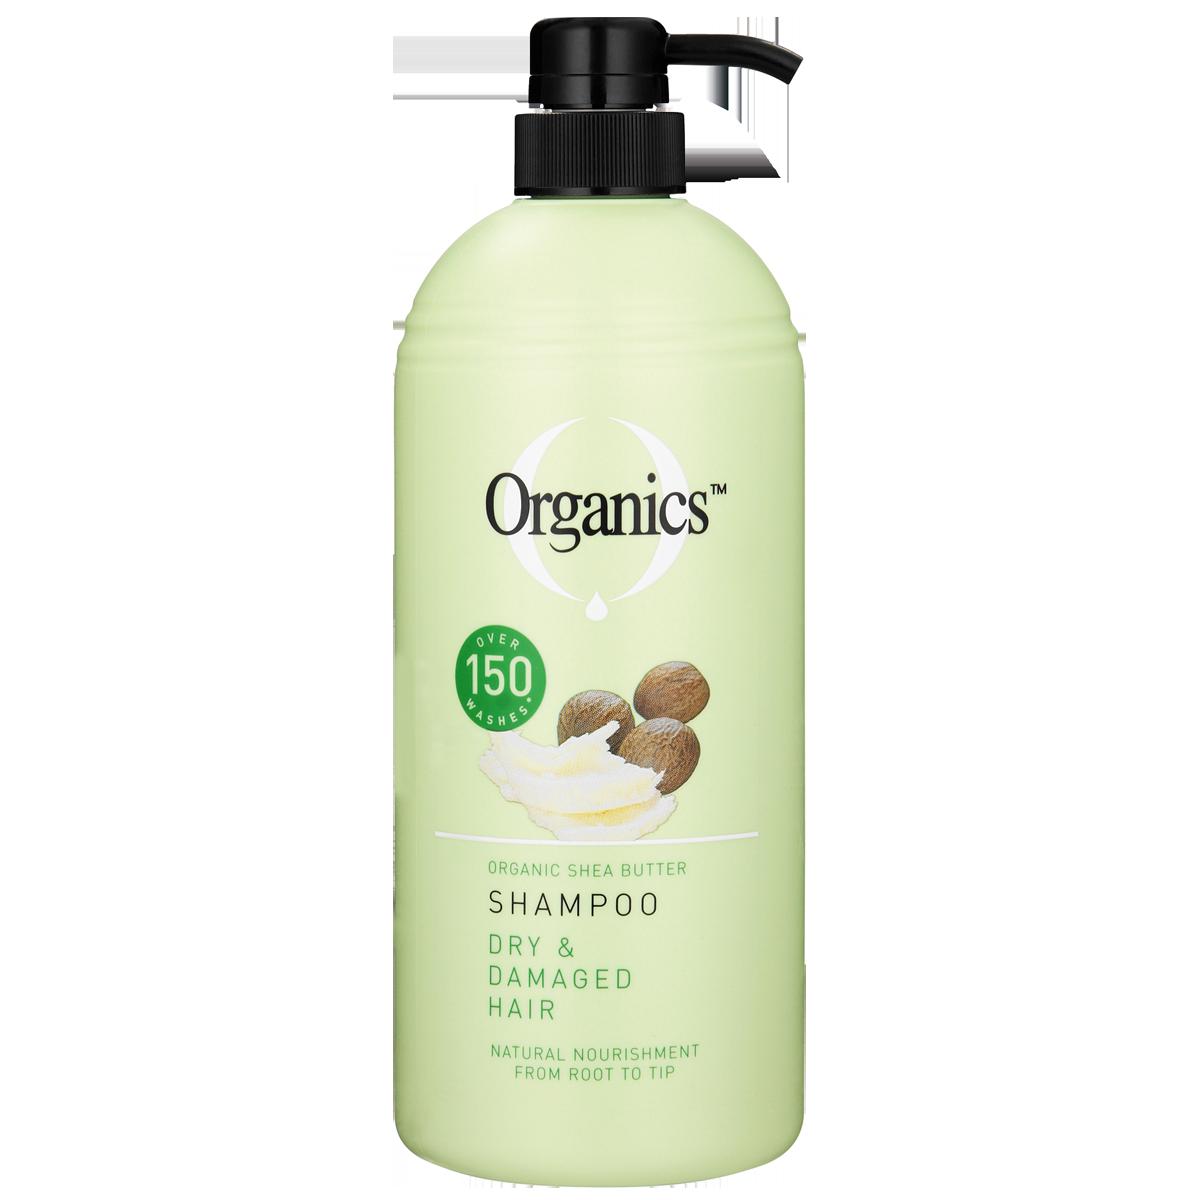 ORGANICS SHAMPOO DAMAGED 1L